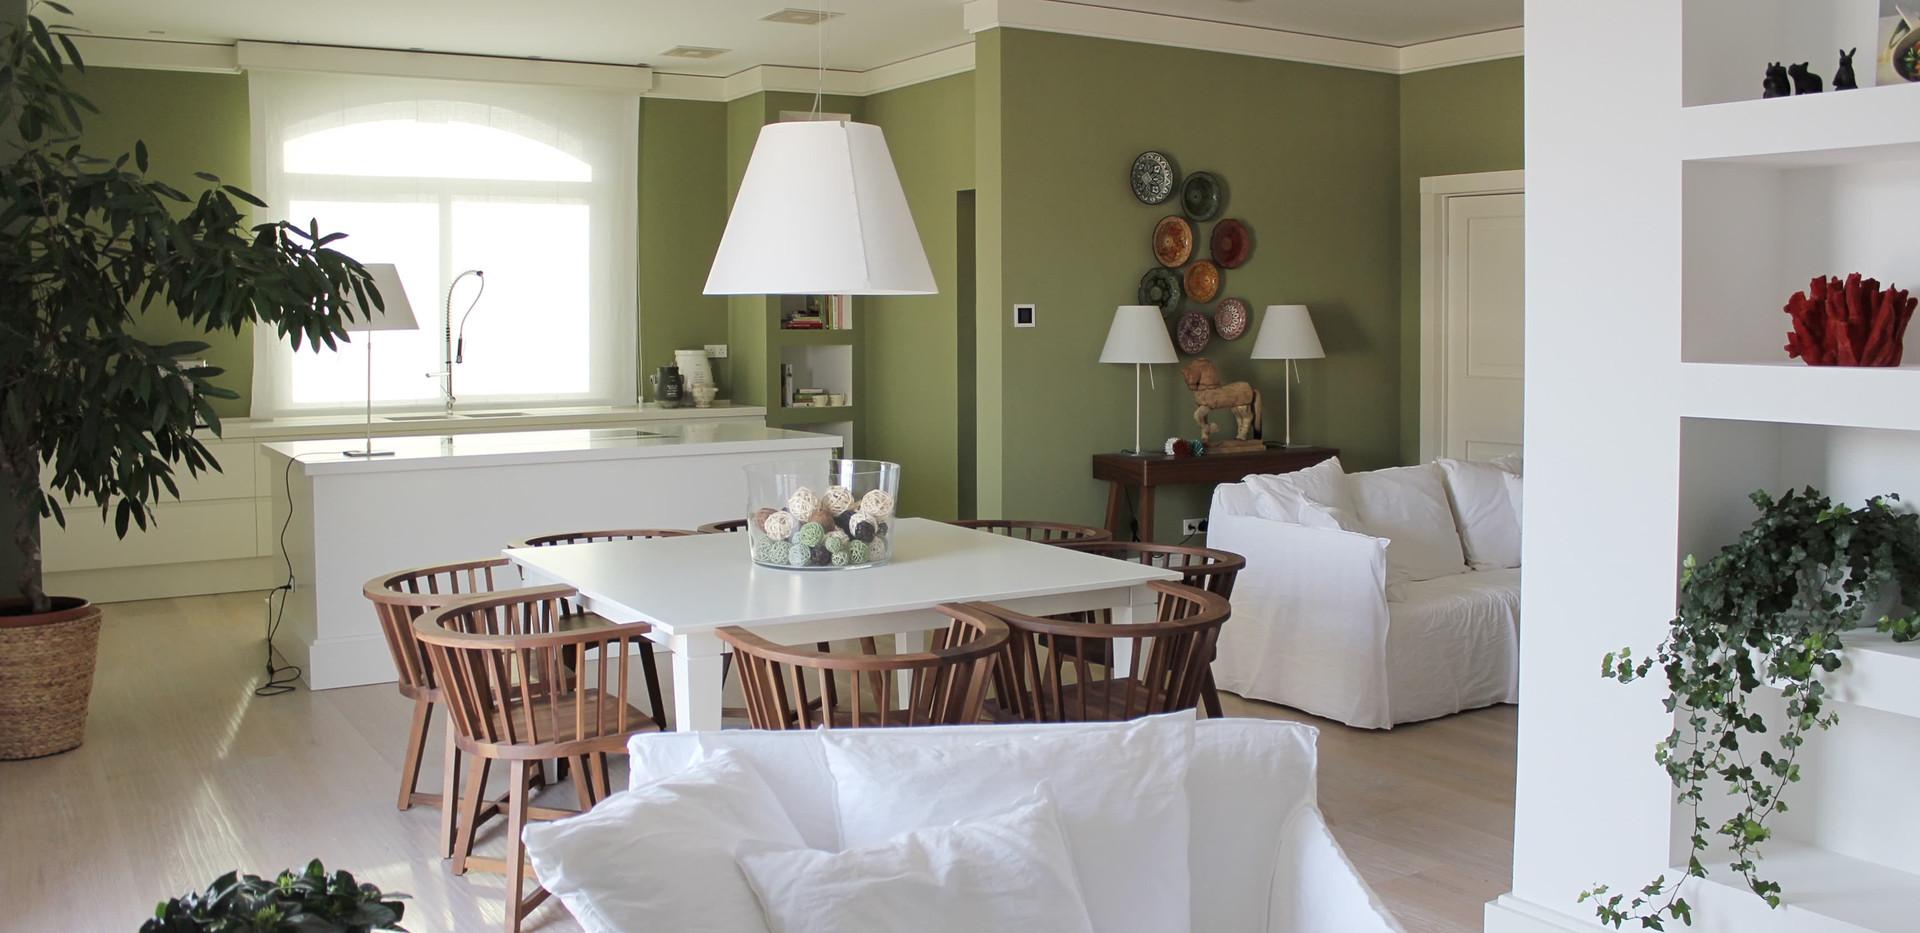 Classicismo Contemporaneo - Ernesto Fusco Interior Design 2.jpg